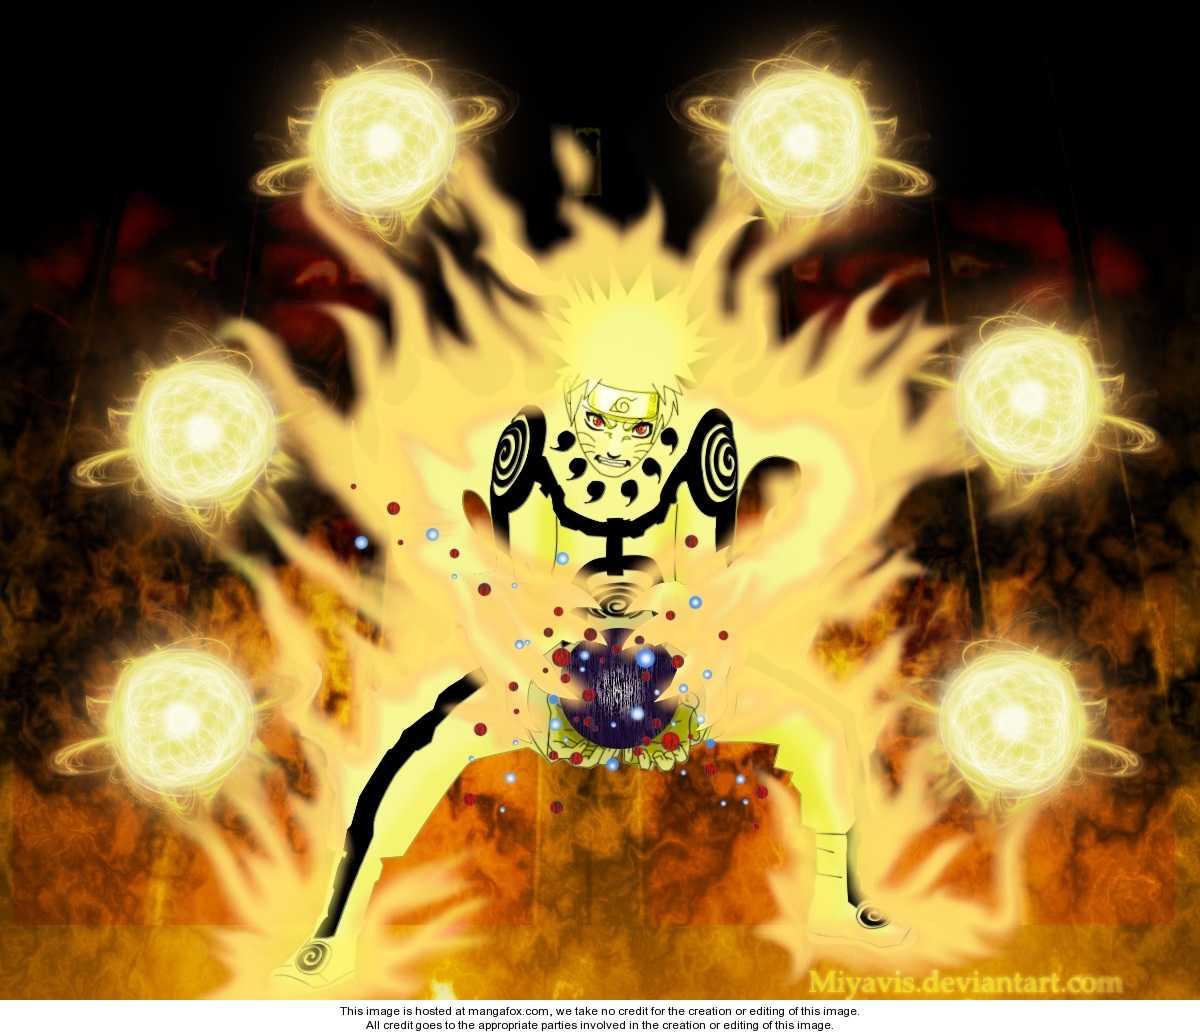 http://2.bp.blogspot.com/-4kXdBJGqUgE/T1D8gMO0c-I/AAAAAAAAAuA/l8AH9TUD2OI/s1600/Naruto-nine-tails-chakra-mode-uzumaki-naruto-shippuuden-25696637-1200-1036.jpg